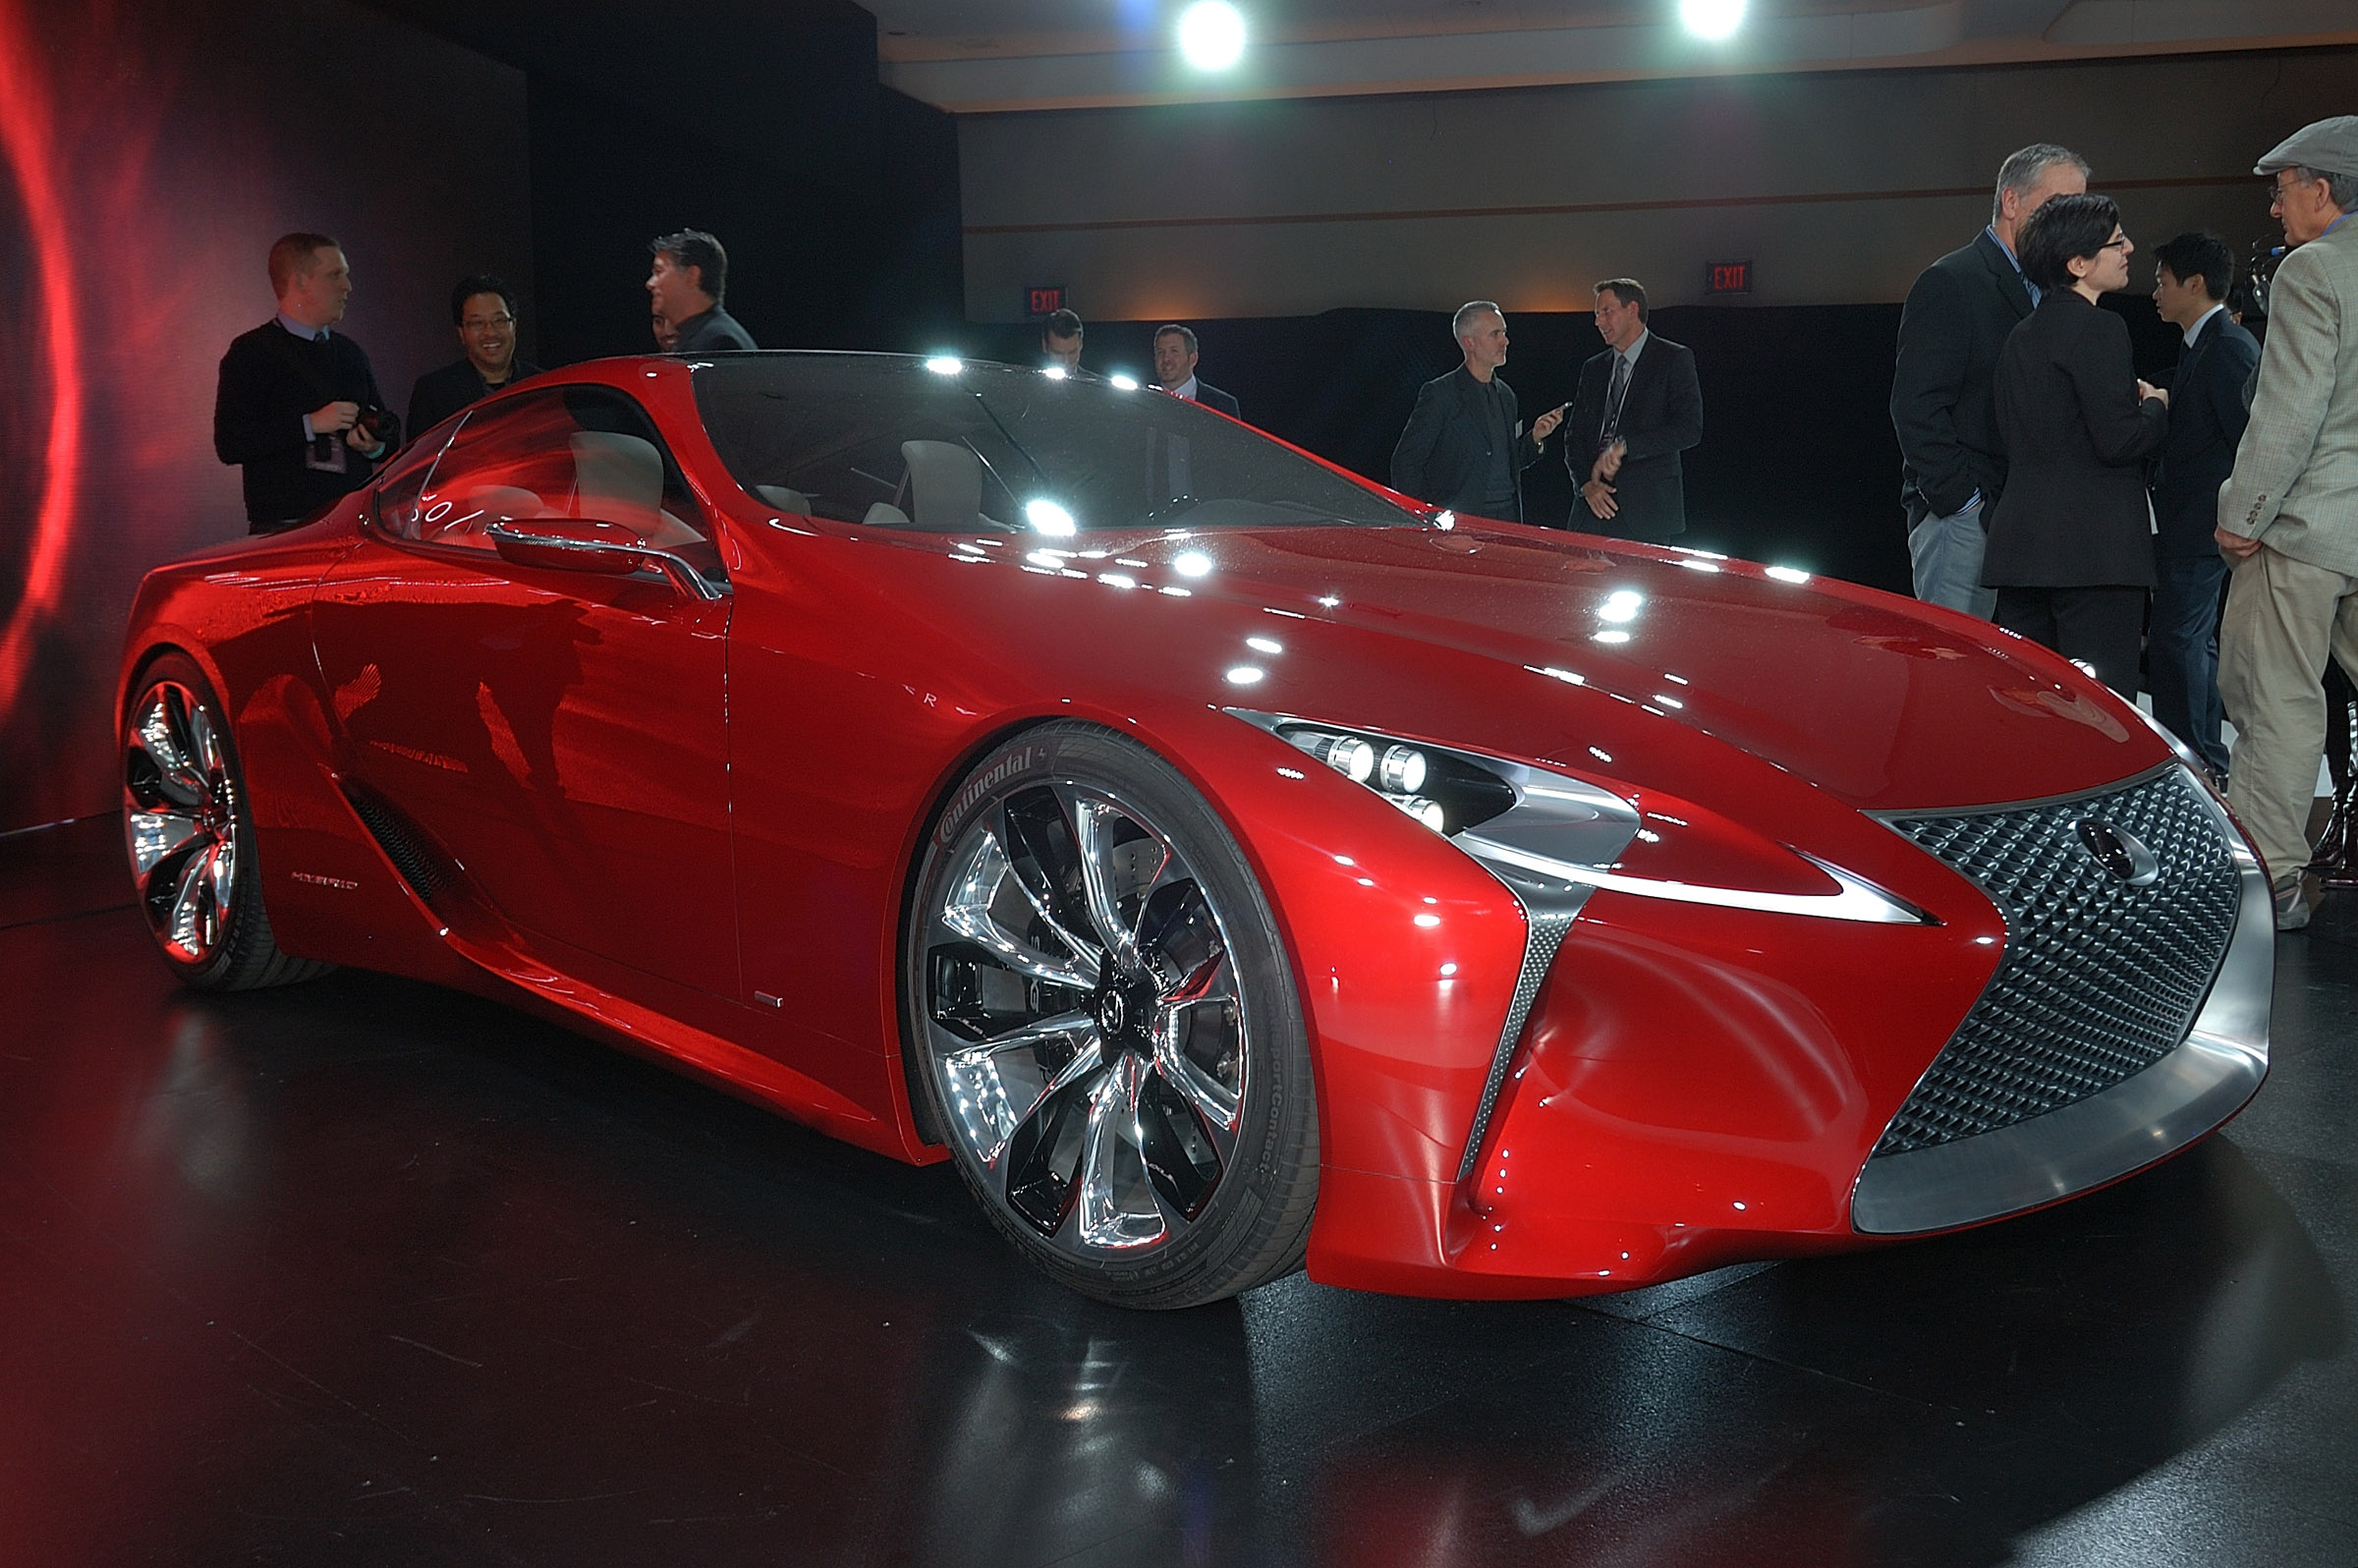 http://www.automobilesreview.com/img/2012-lexus-lf-lc-concept-detroit-2012/2012-lexus-lf-lc-concept-detroit-2012-02.jpg